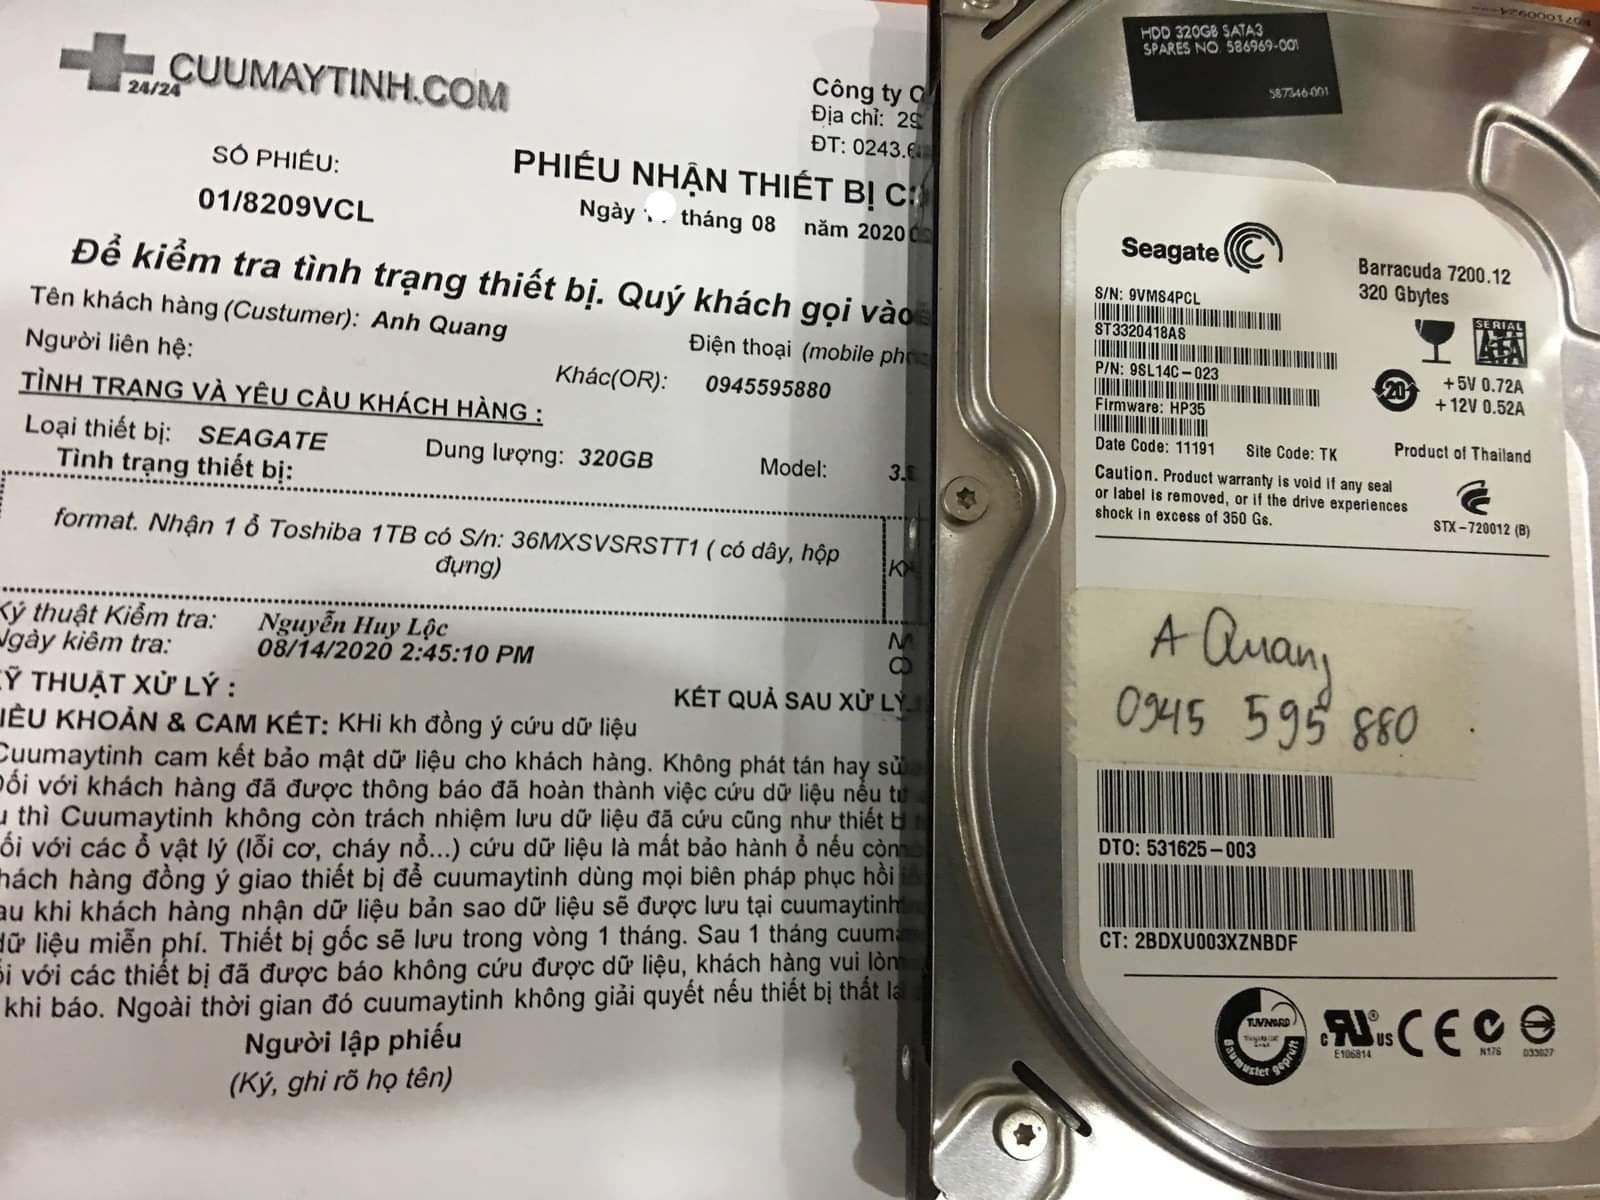 Lấy dữ liệu ổ cứng Seagate 320GB mất dữ liệu 14/08/2020 - cuumaytinh